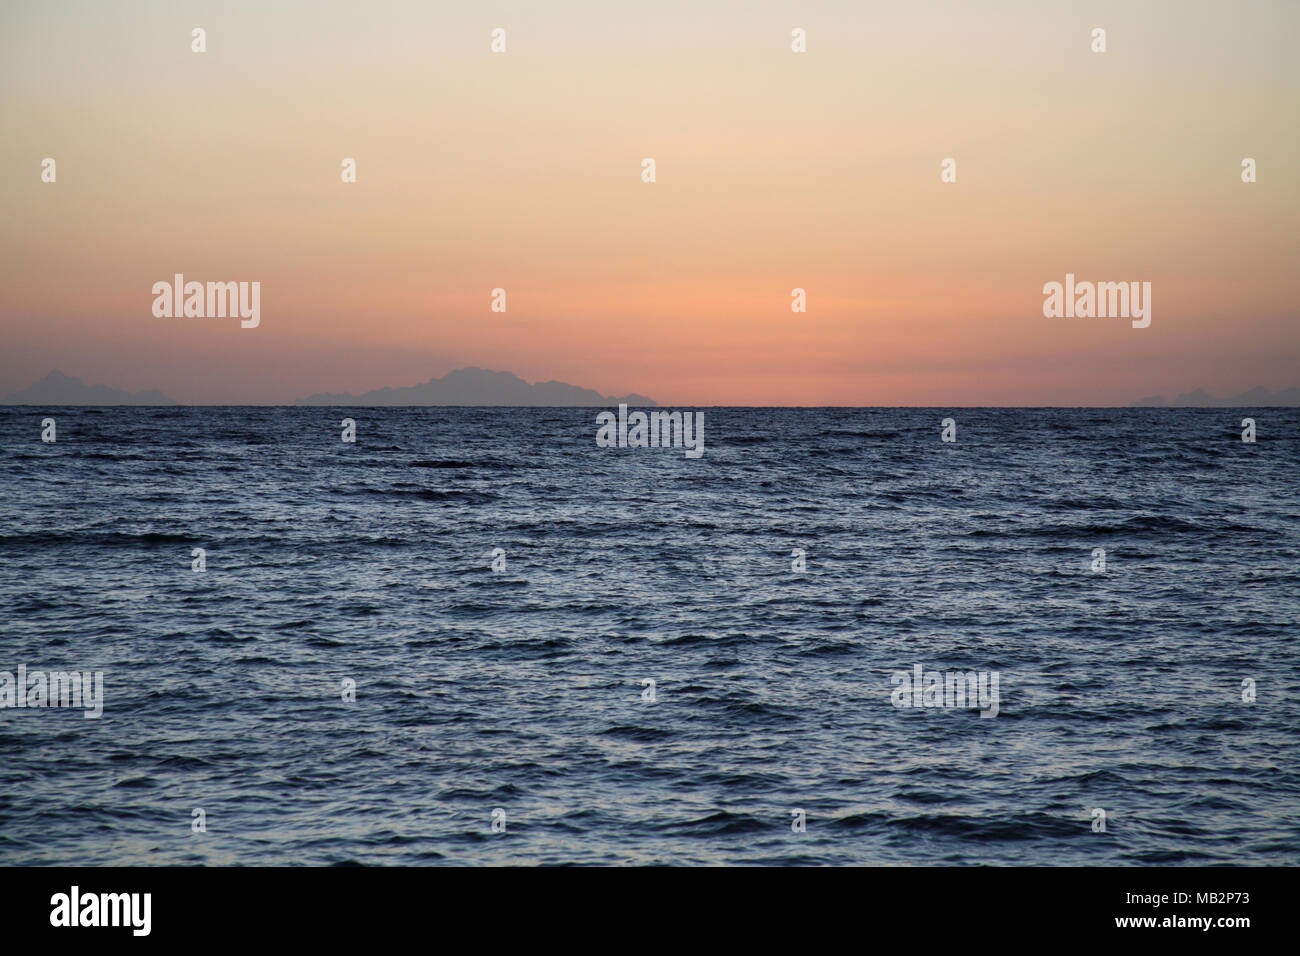 Sonnenaufgang, Meer, Insel Tiran, Ägypten, Afrika Stockbild